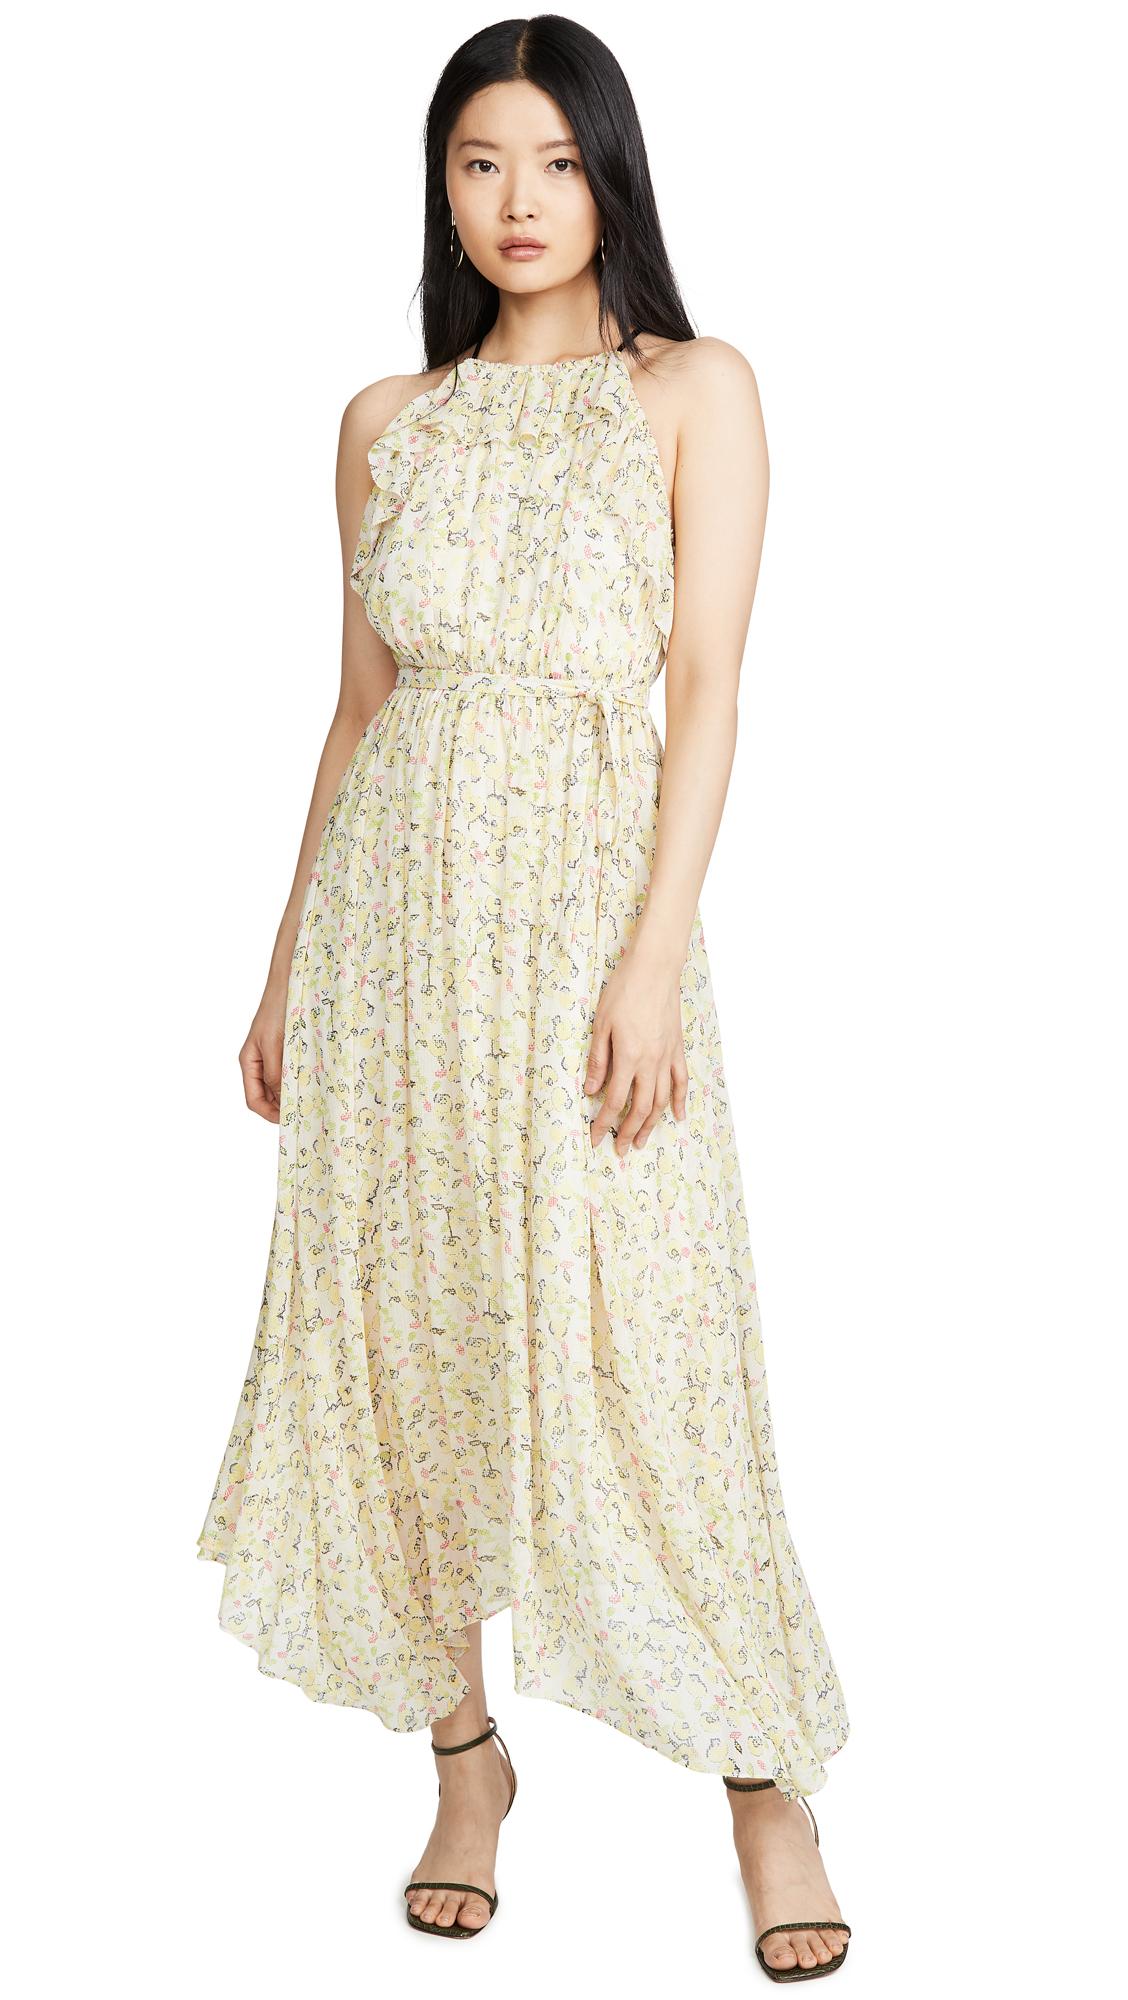 Jason Wu Floral Maxi Dress